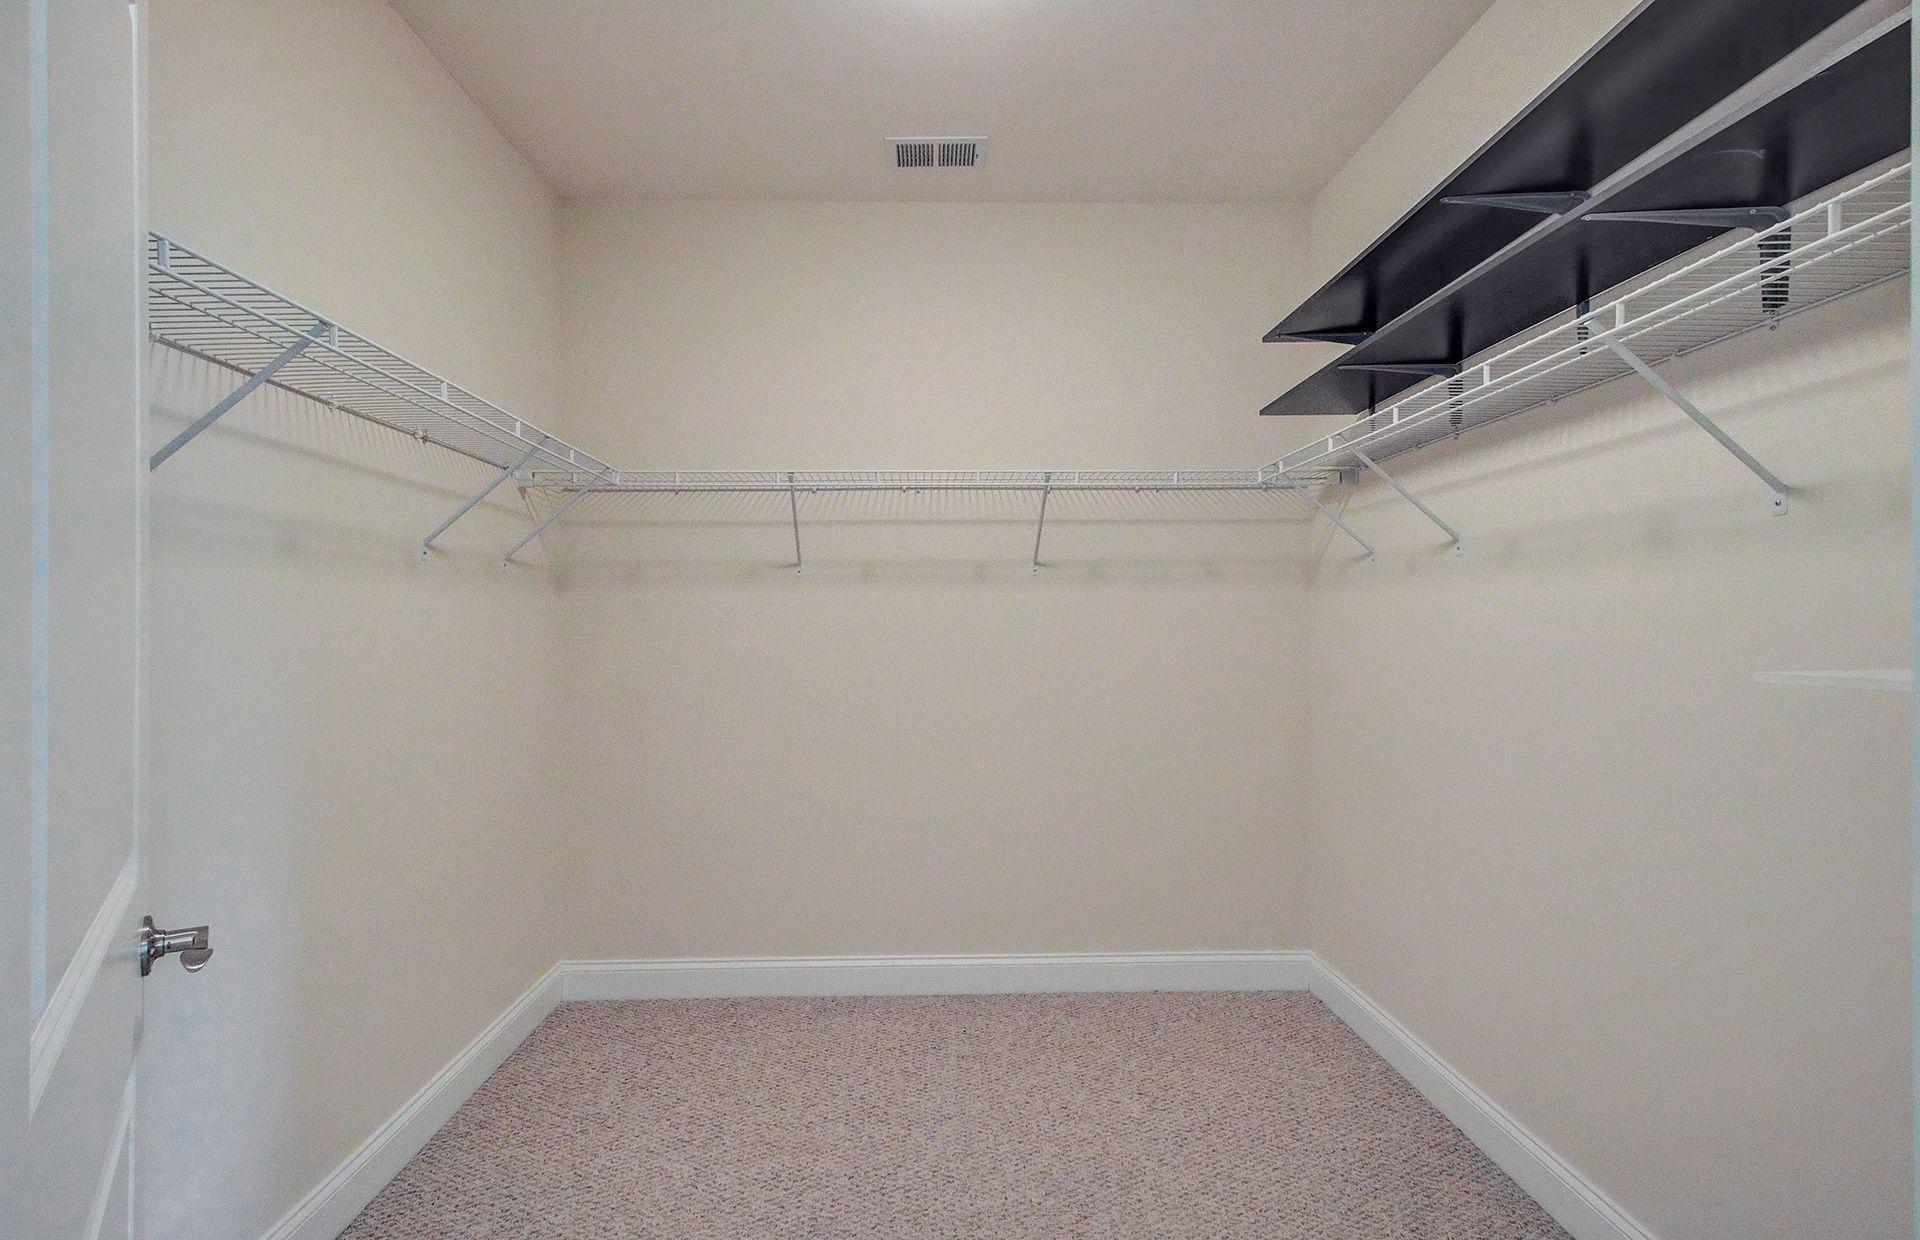 Linnen Place Homes For Sale - 1275 Shingleback, Mount Pleasant, SC - 27